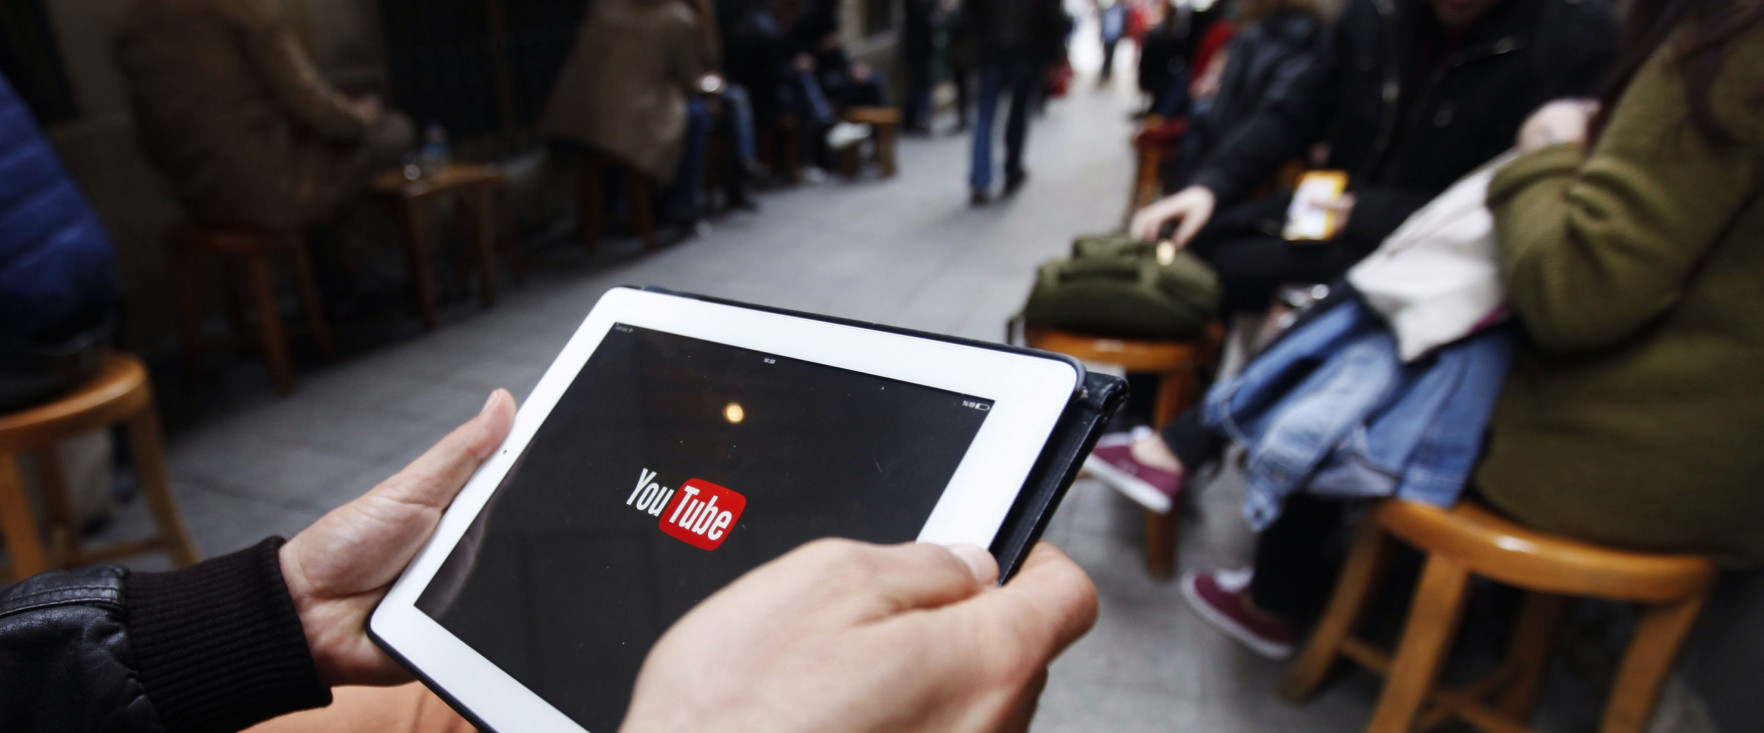 Bagaimana Cara Meningkatkan Penjualan dengan Video?